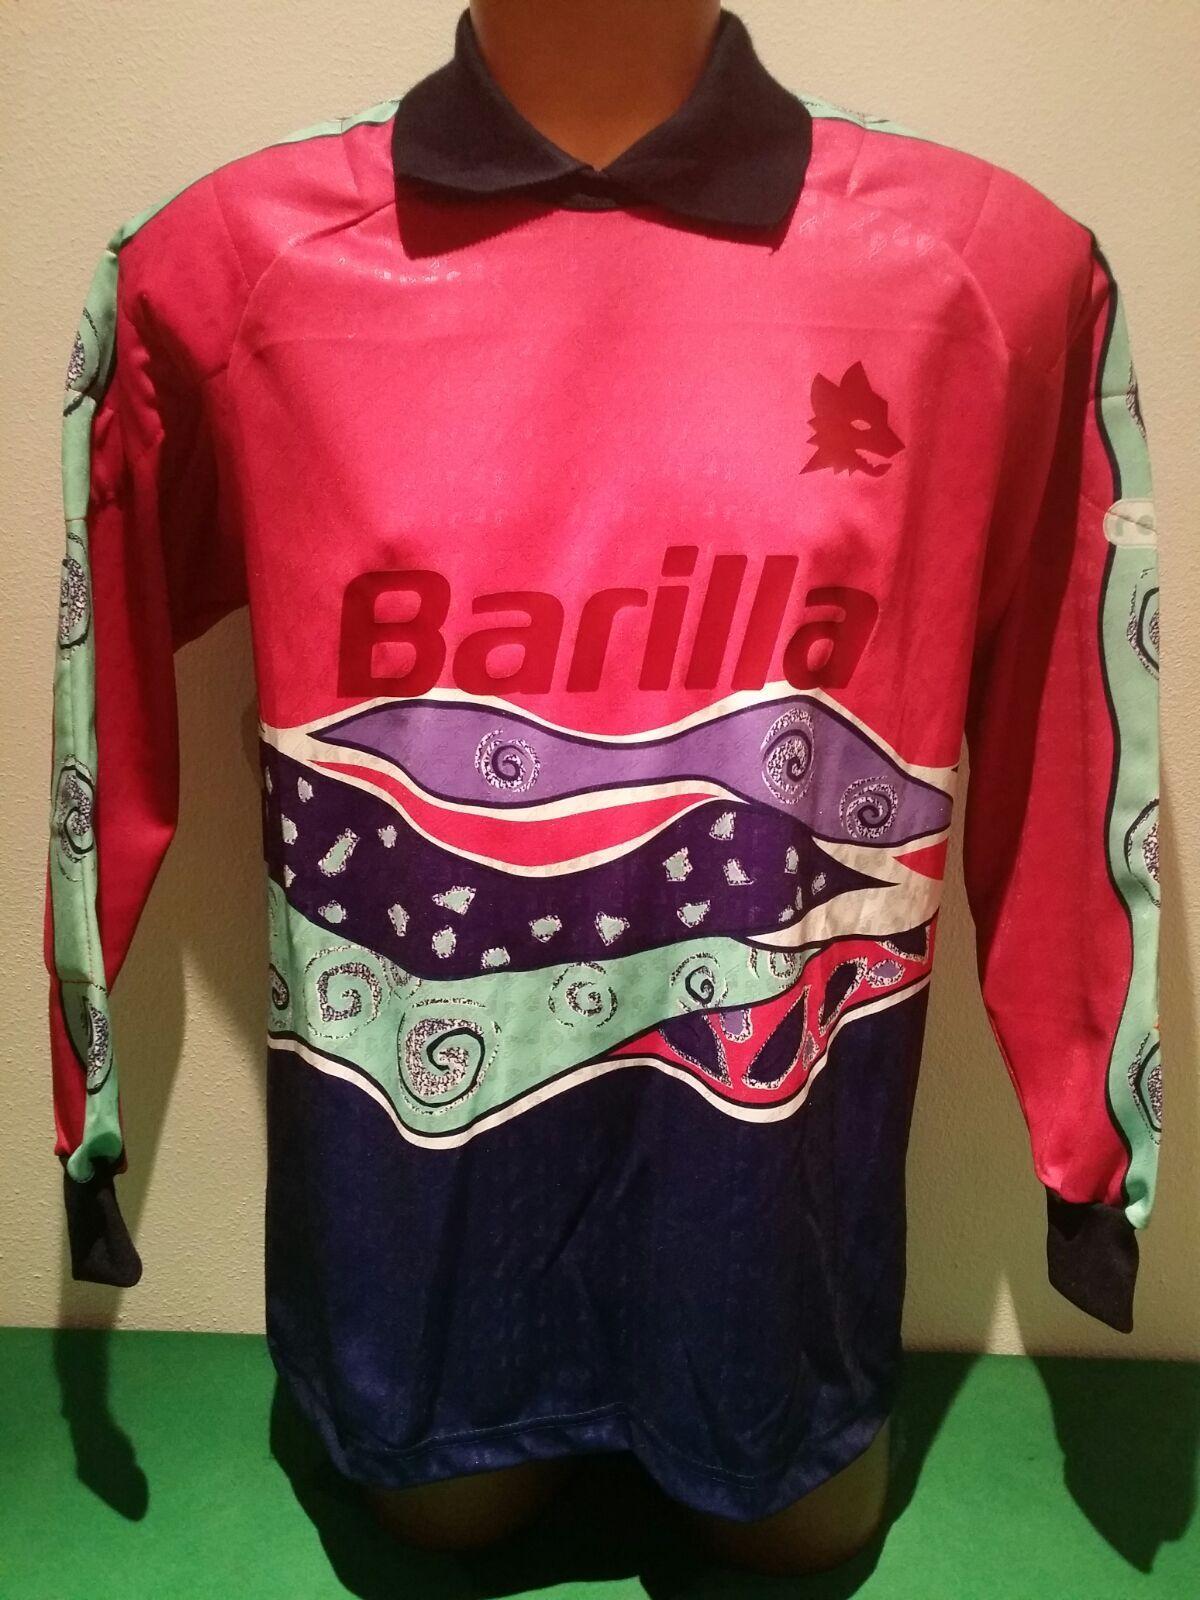 Maglia lorieri roma barilla nomatch worn issued REUSCH goalkeeper adidas 1992 93